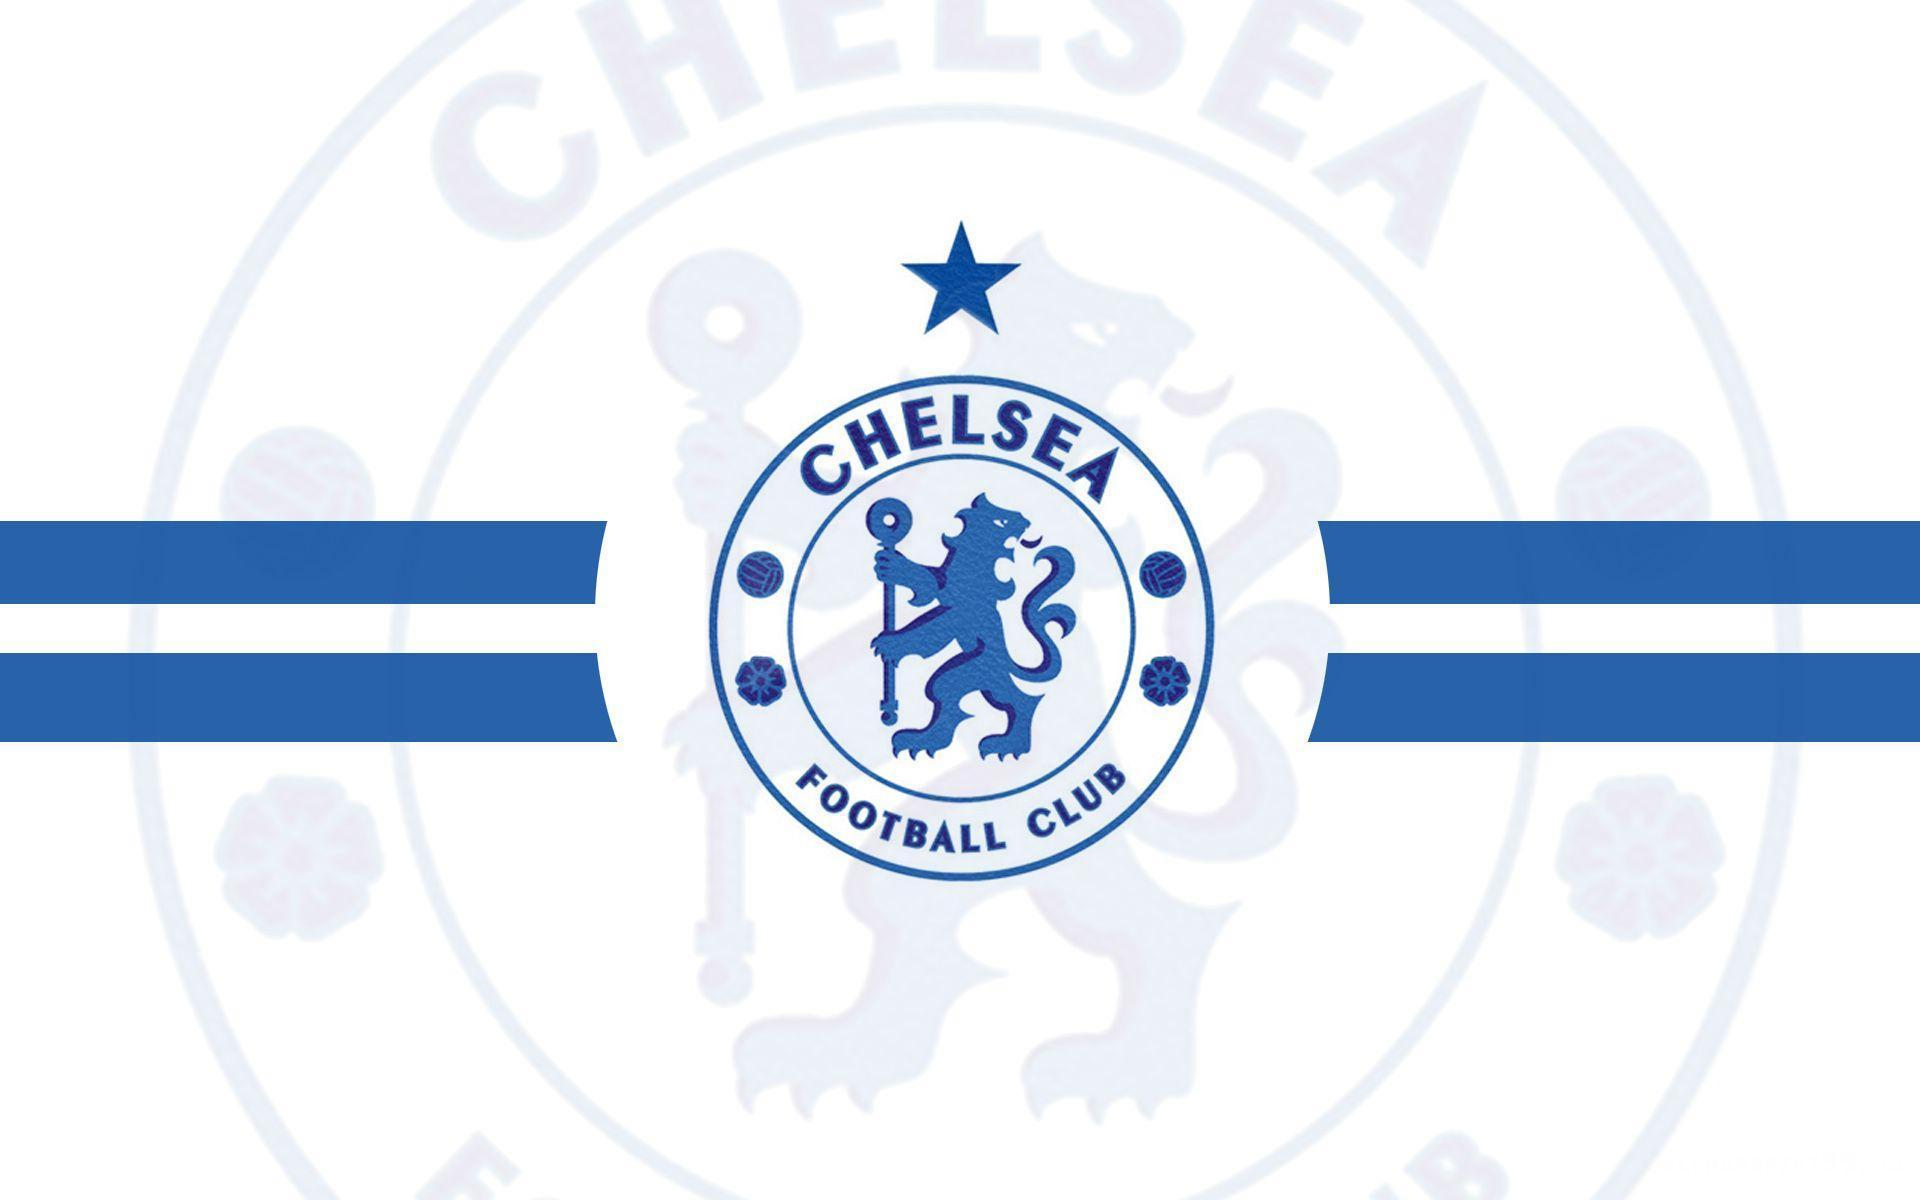 Chelsea hd wallpapers 2016 wallpaper cave - Chelsea wallpaper 4k ...